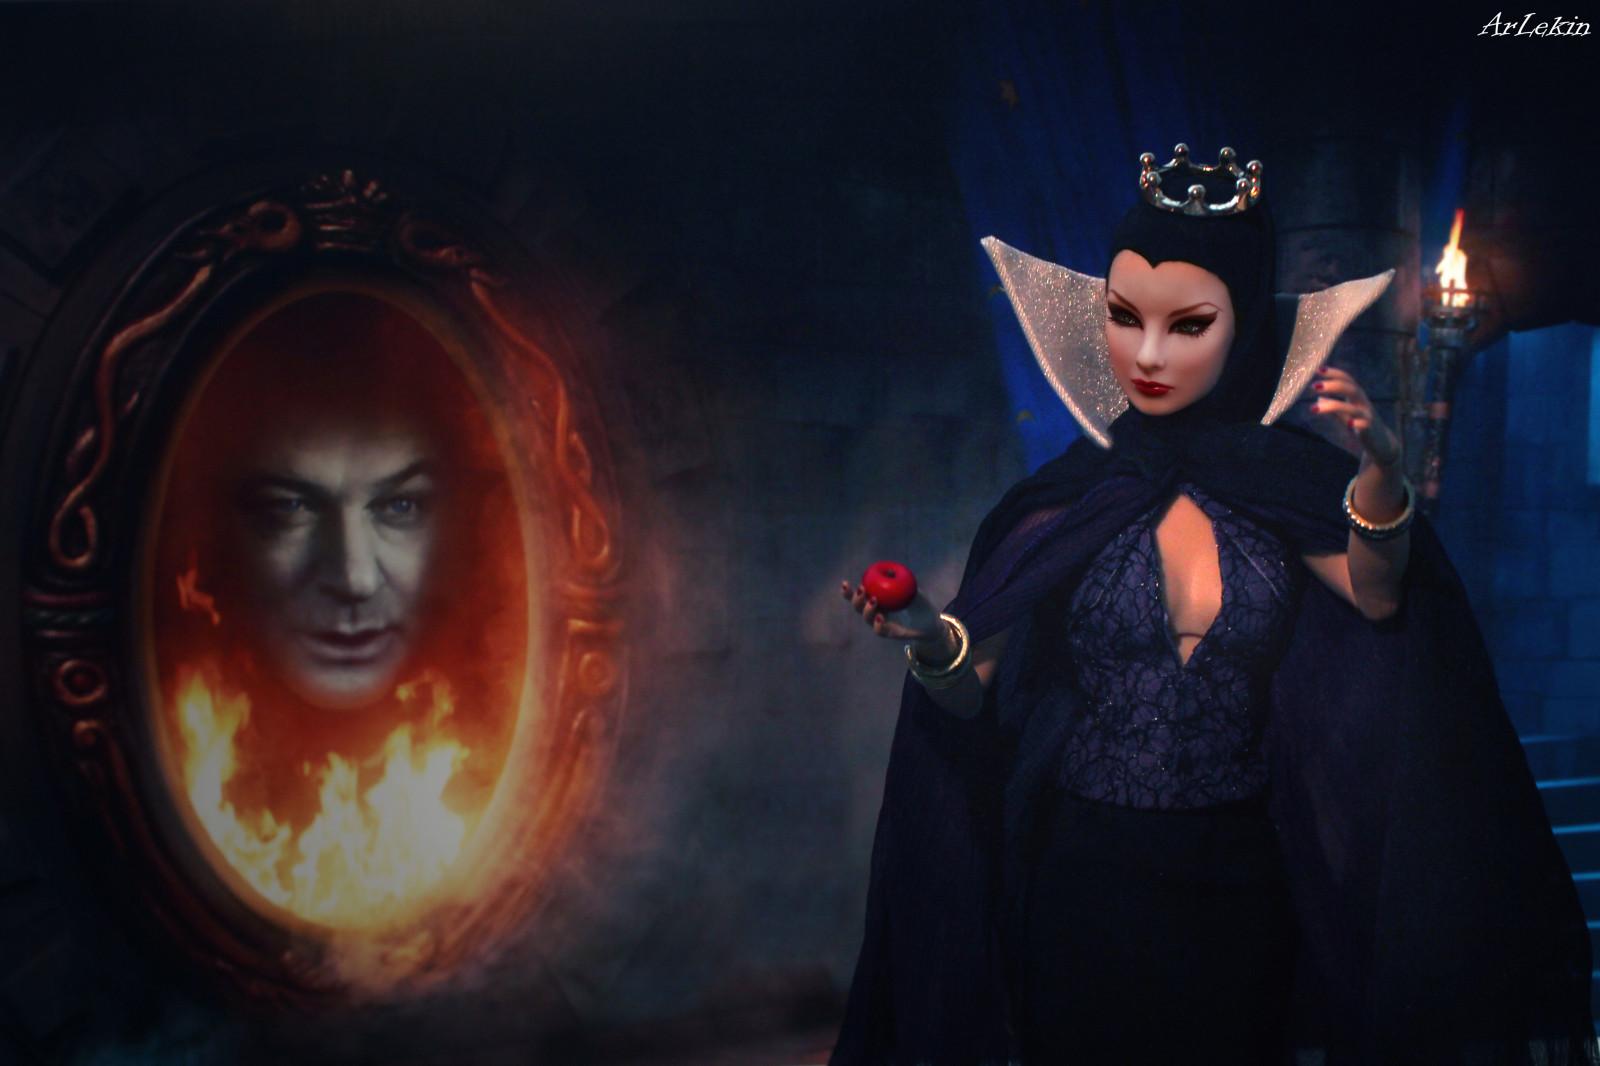 Wallpaper Halloween Cartoon Castle Mirror Witch Crown Disney Villain Midnight Apple Darkness Fairytale Screenshot Integrity Computer Wallpaper Special Effects Fashiondoll Fashionroyalty Nuface Torch Phenomenon Giselle Jasonwu